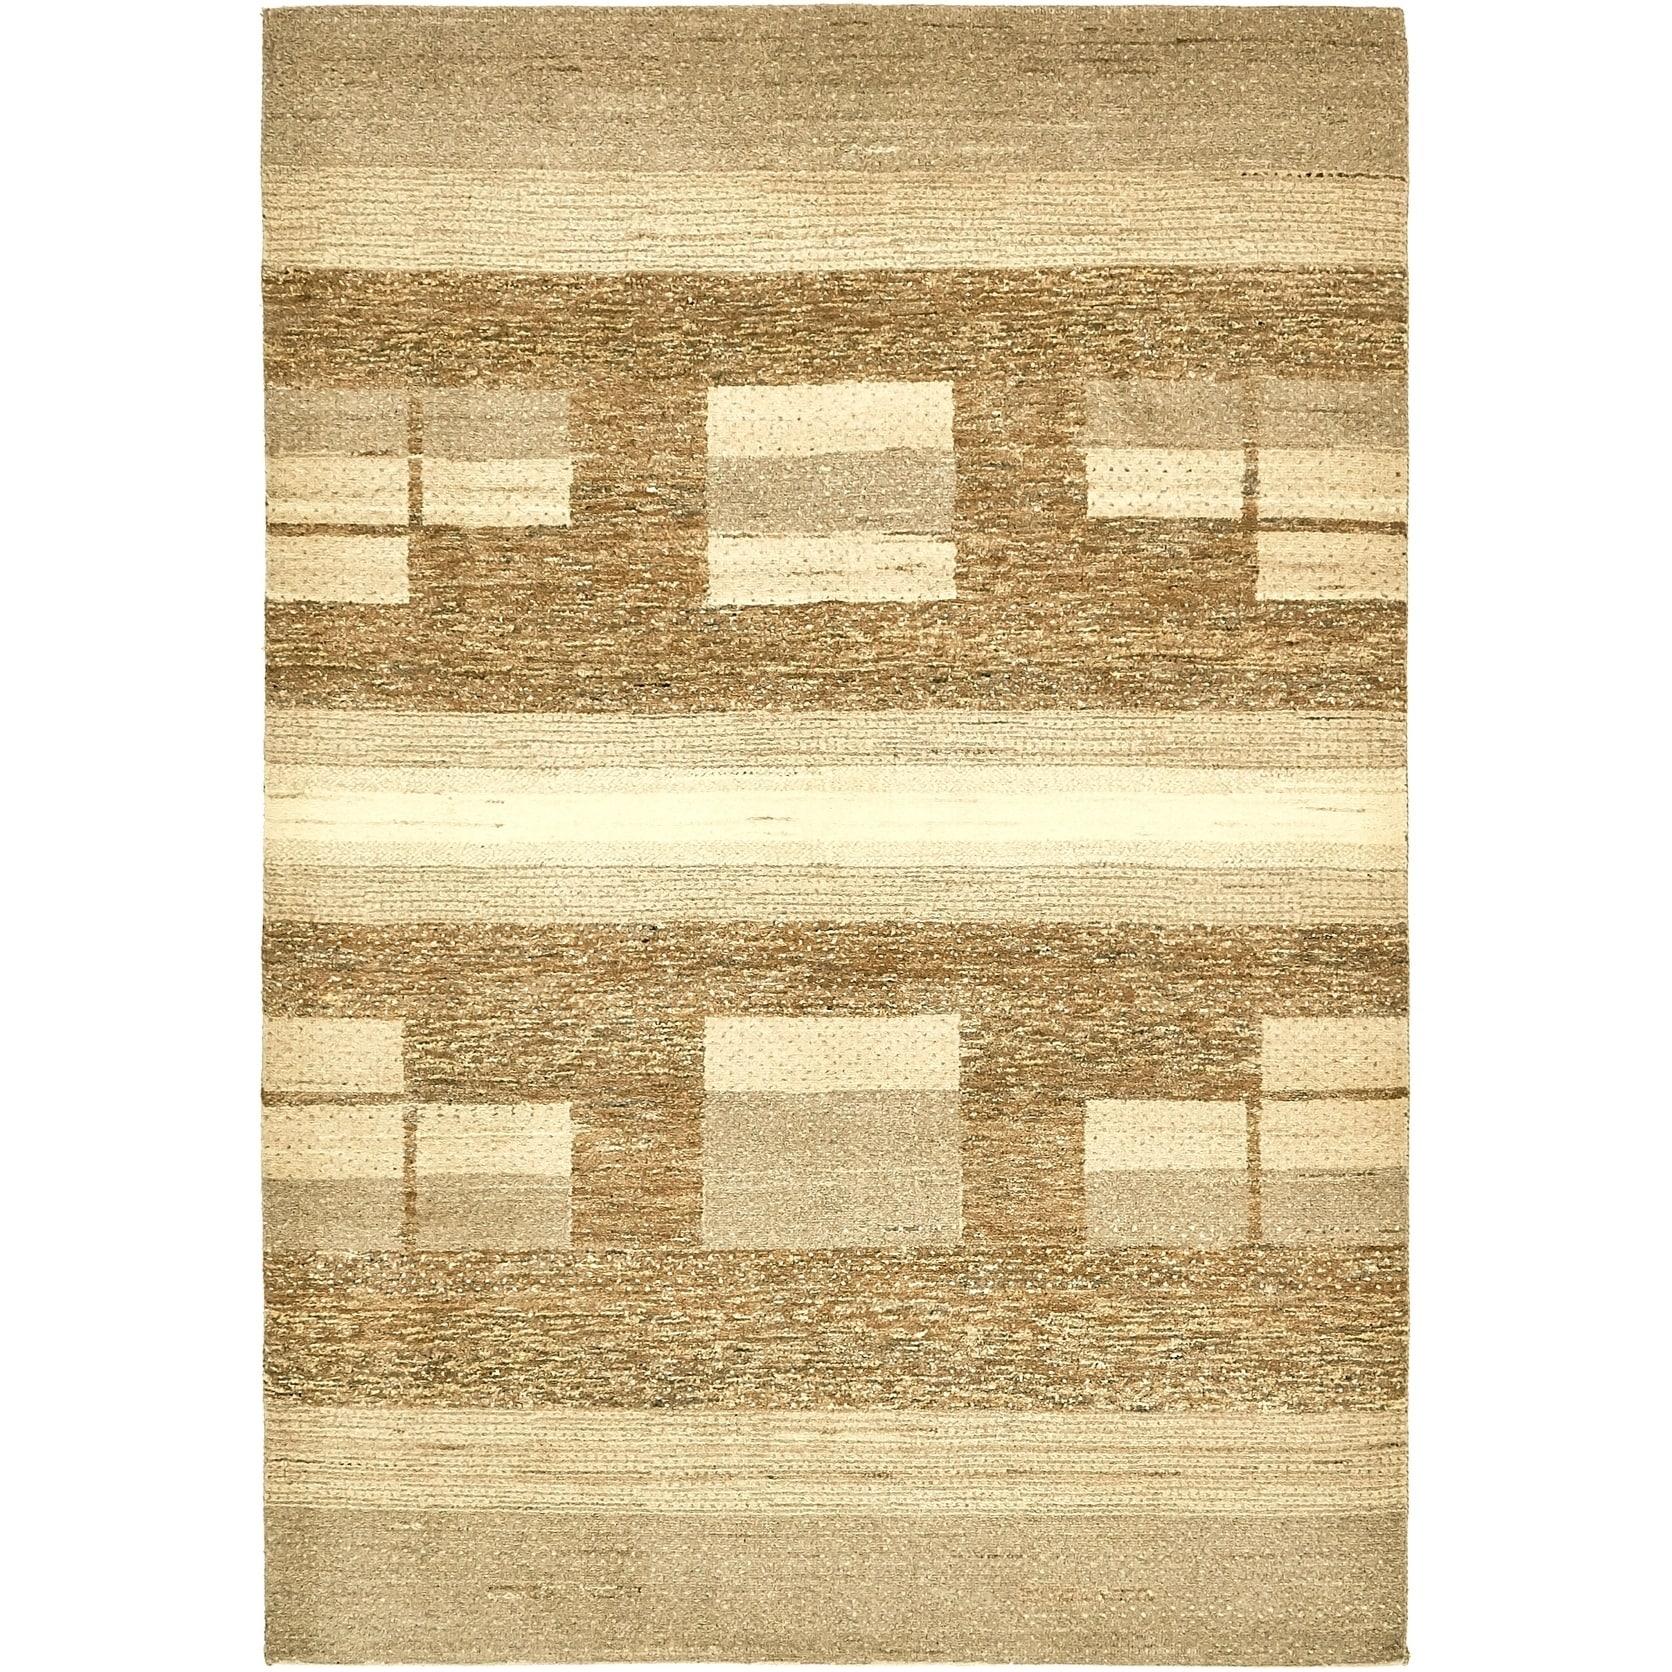 Hand Knotted Kashkuli Gabbeh Wool Area Rug - 4 8 x 6 9 (Beige - 4 8 x 6 9)